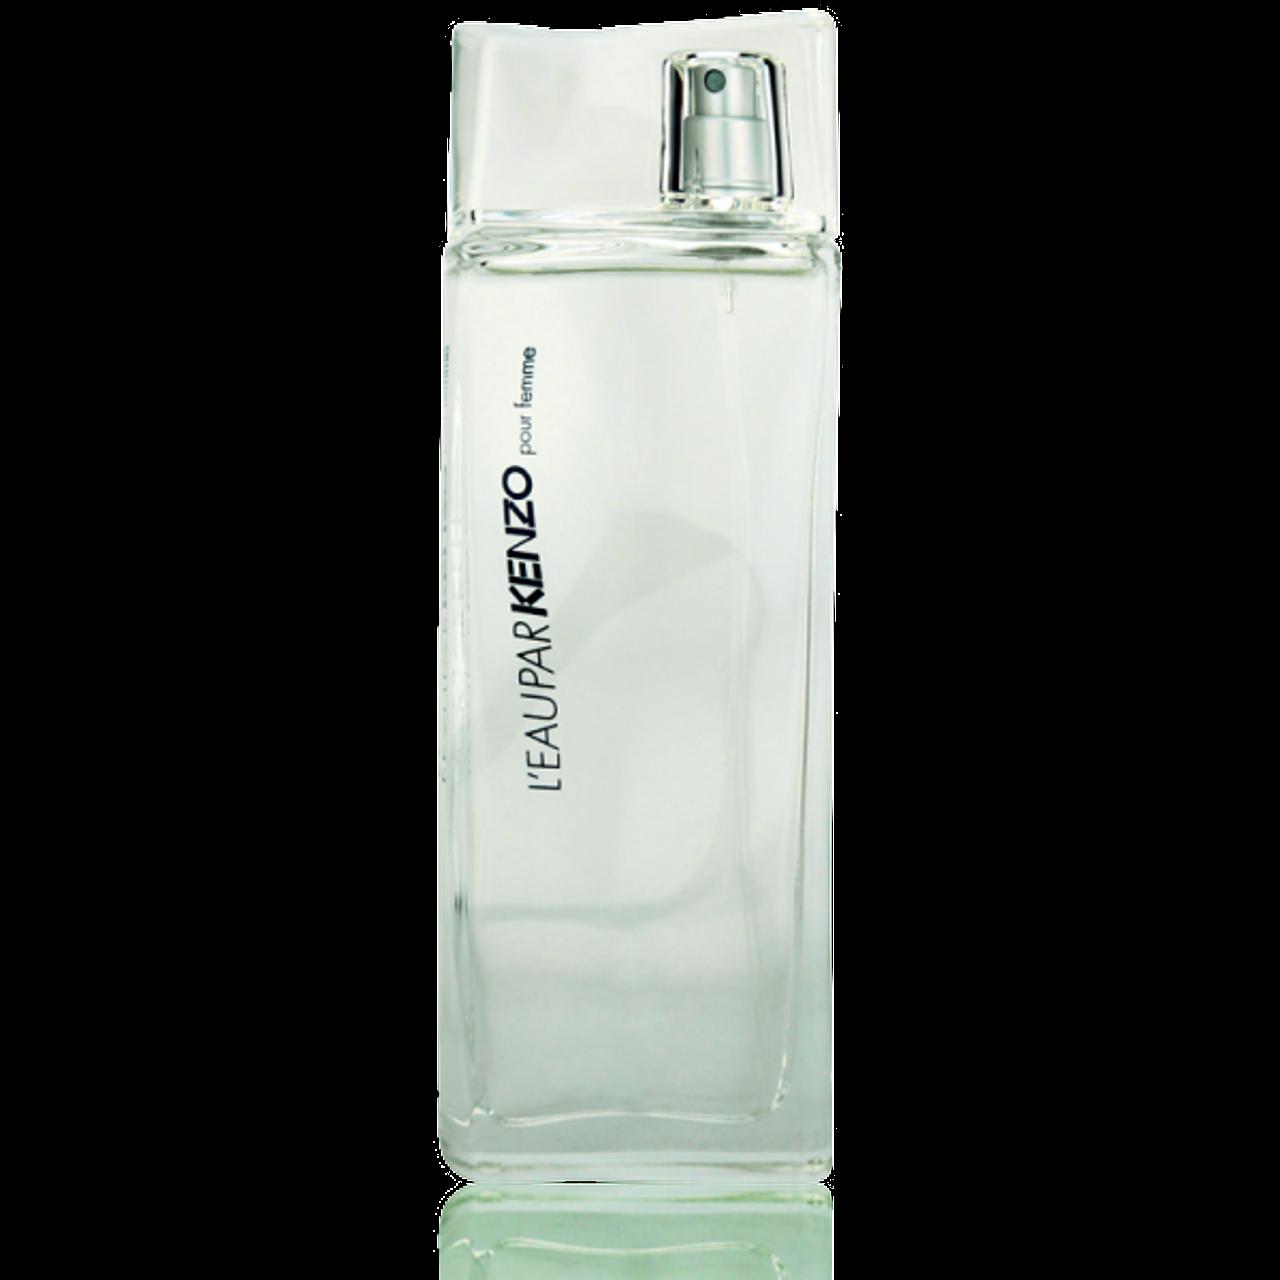 Kenzo L'eau Par Kenzo Women EdT 50ml